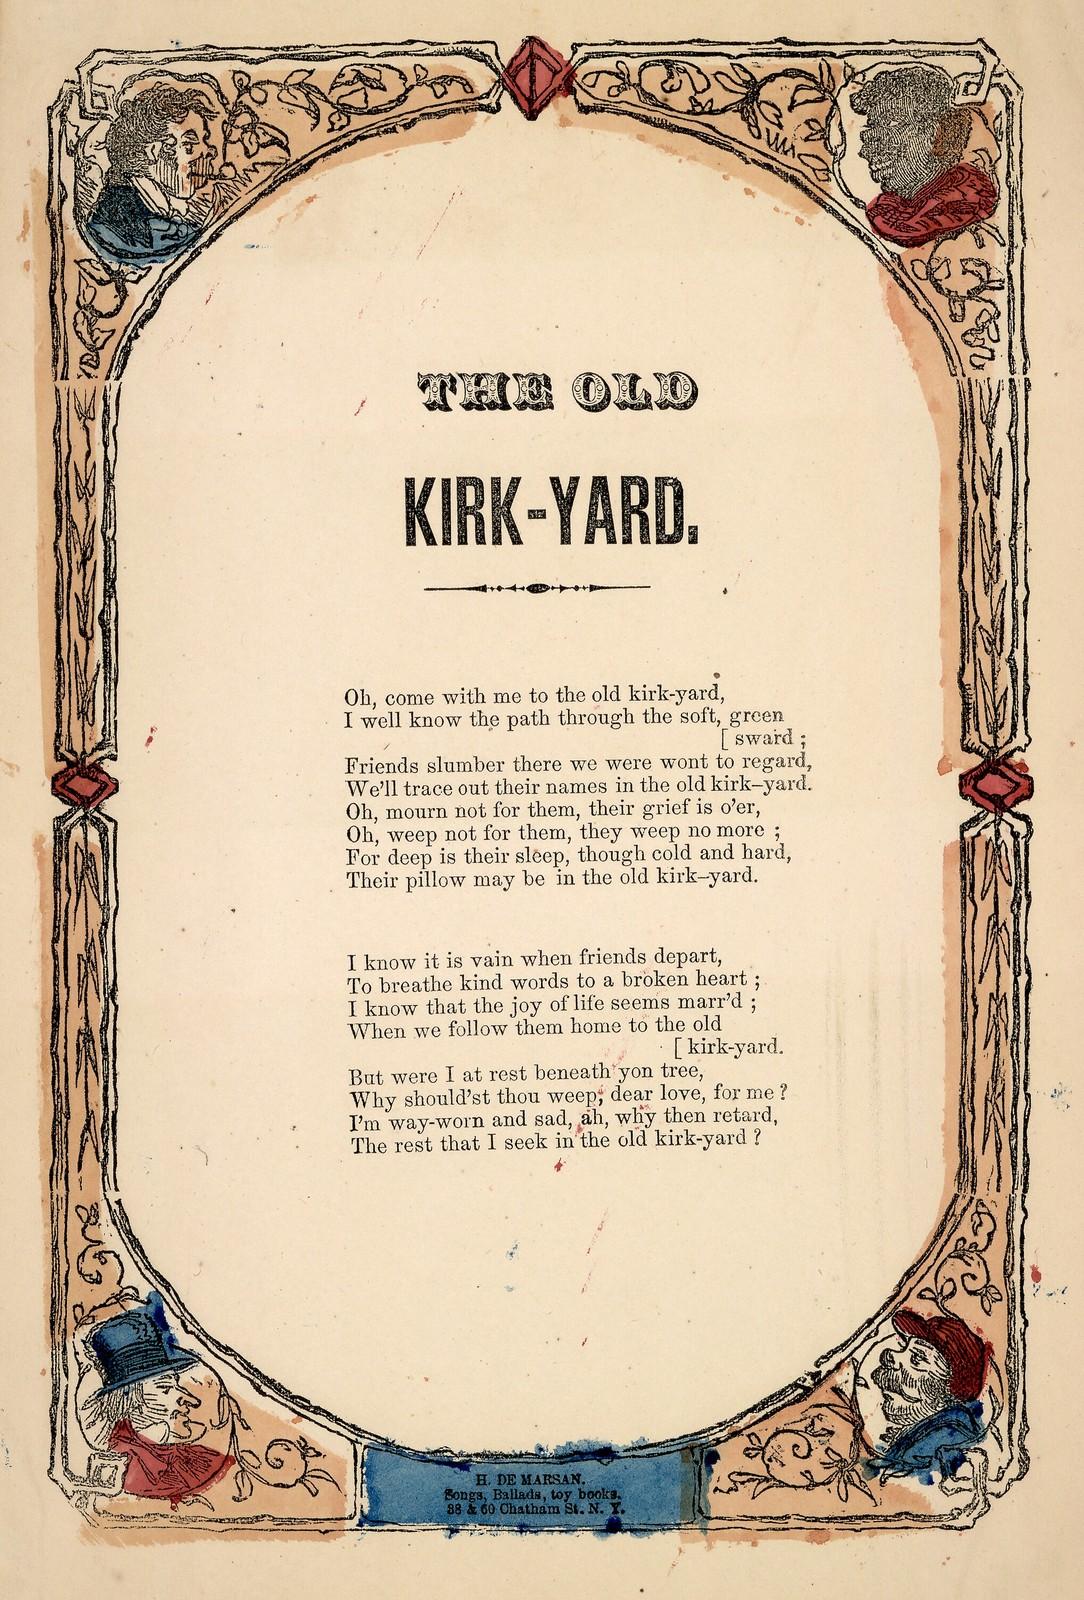 The old kirk-yard. H. De Marsan, Publisher, 38 & 60 Chatham Street, N. Y